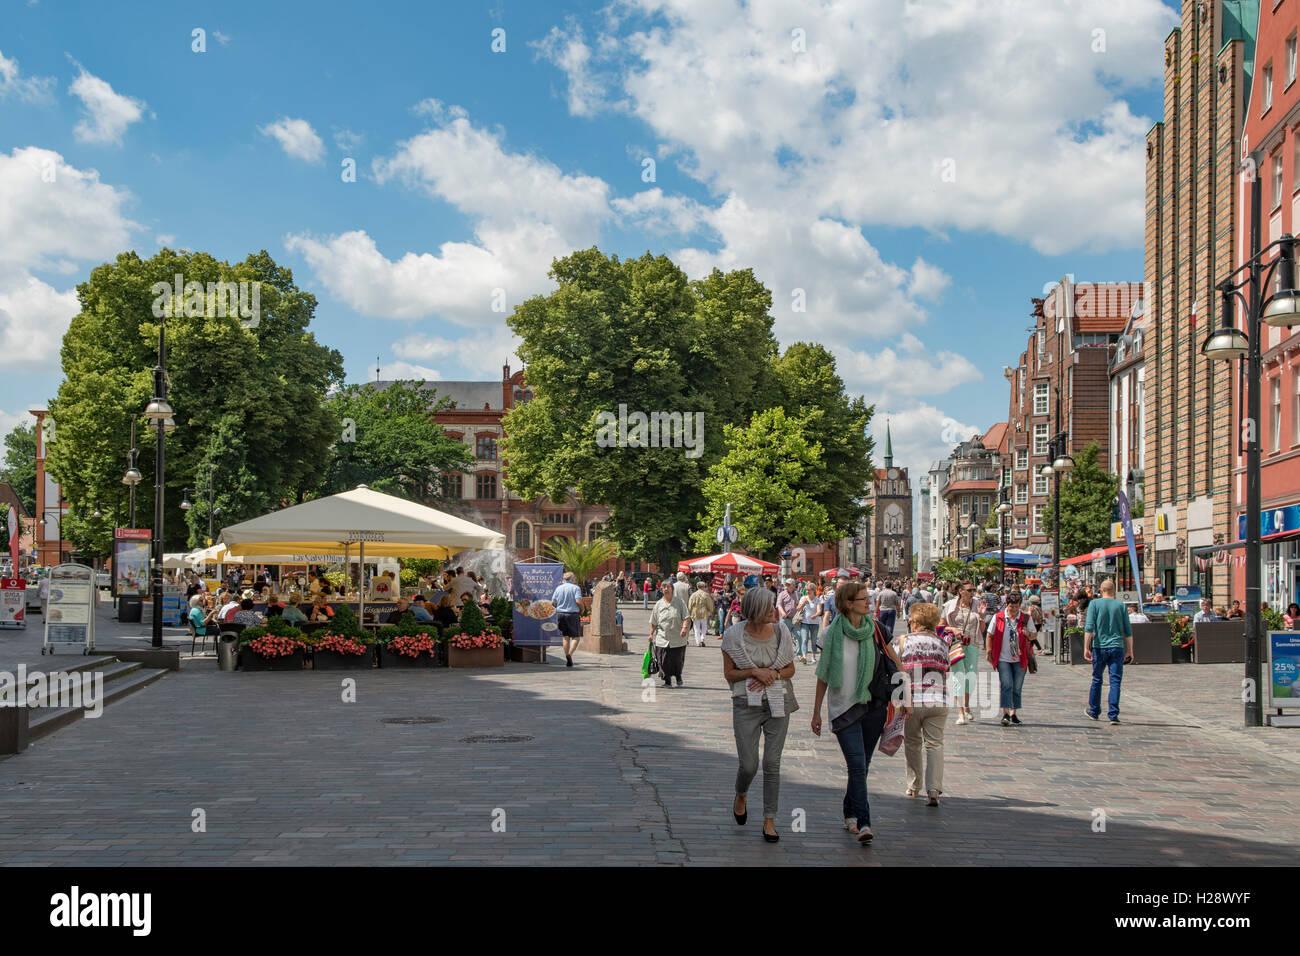 University Square, Rostock, Mecklenburg-Vorpommern, Germany - Stock Image